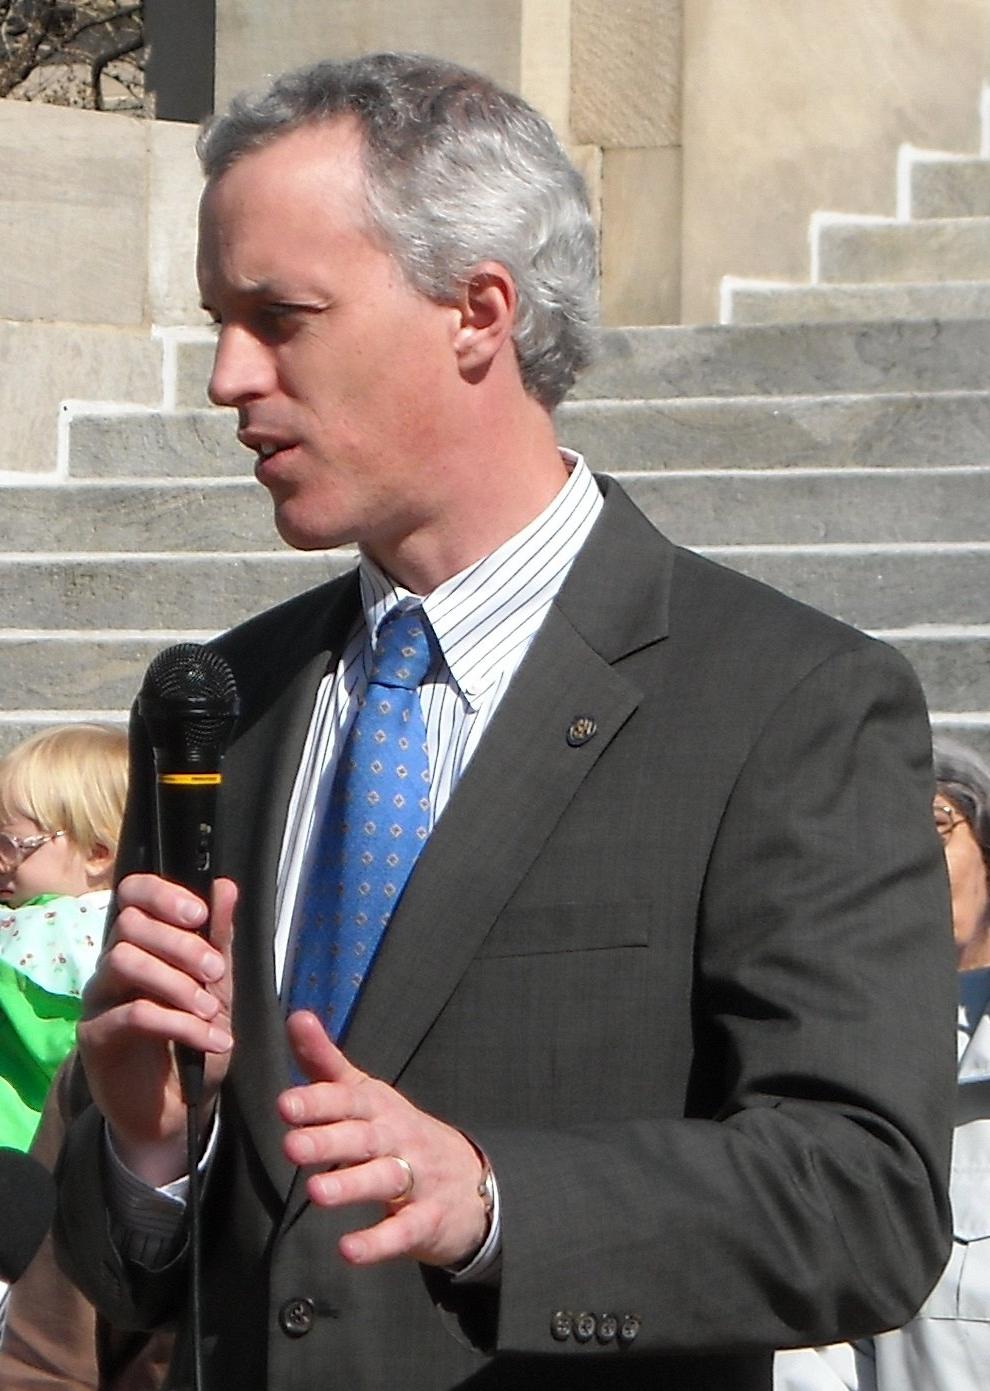 David Blount